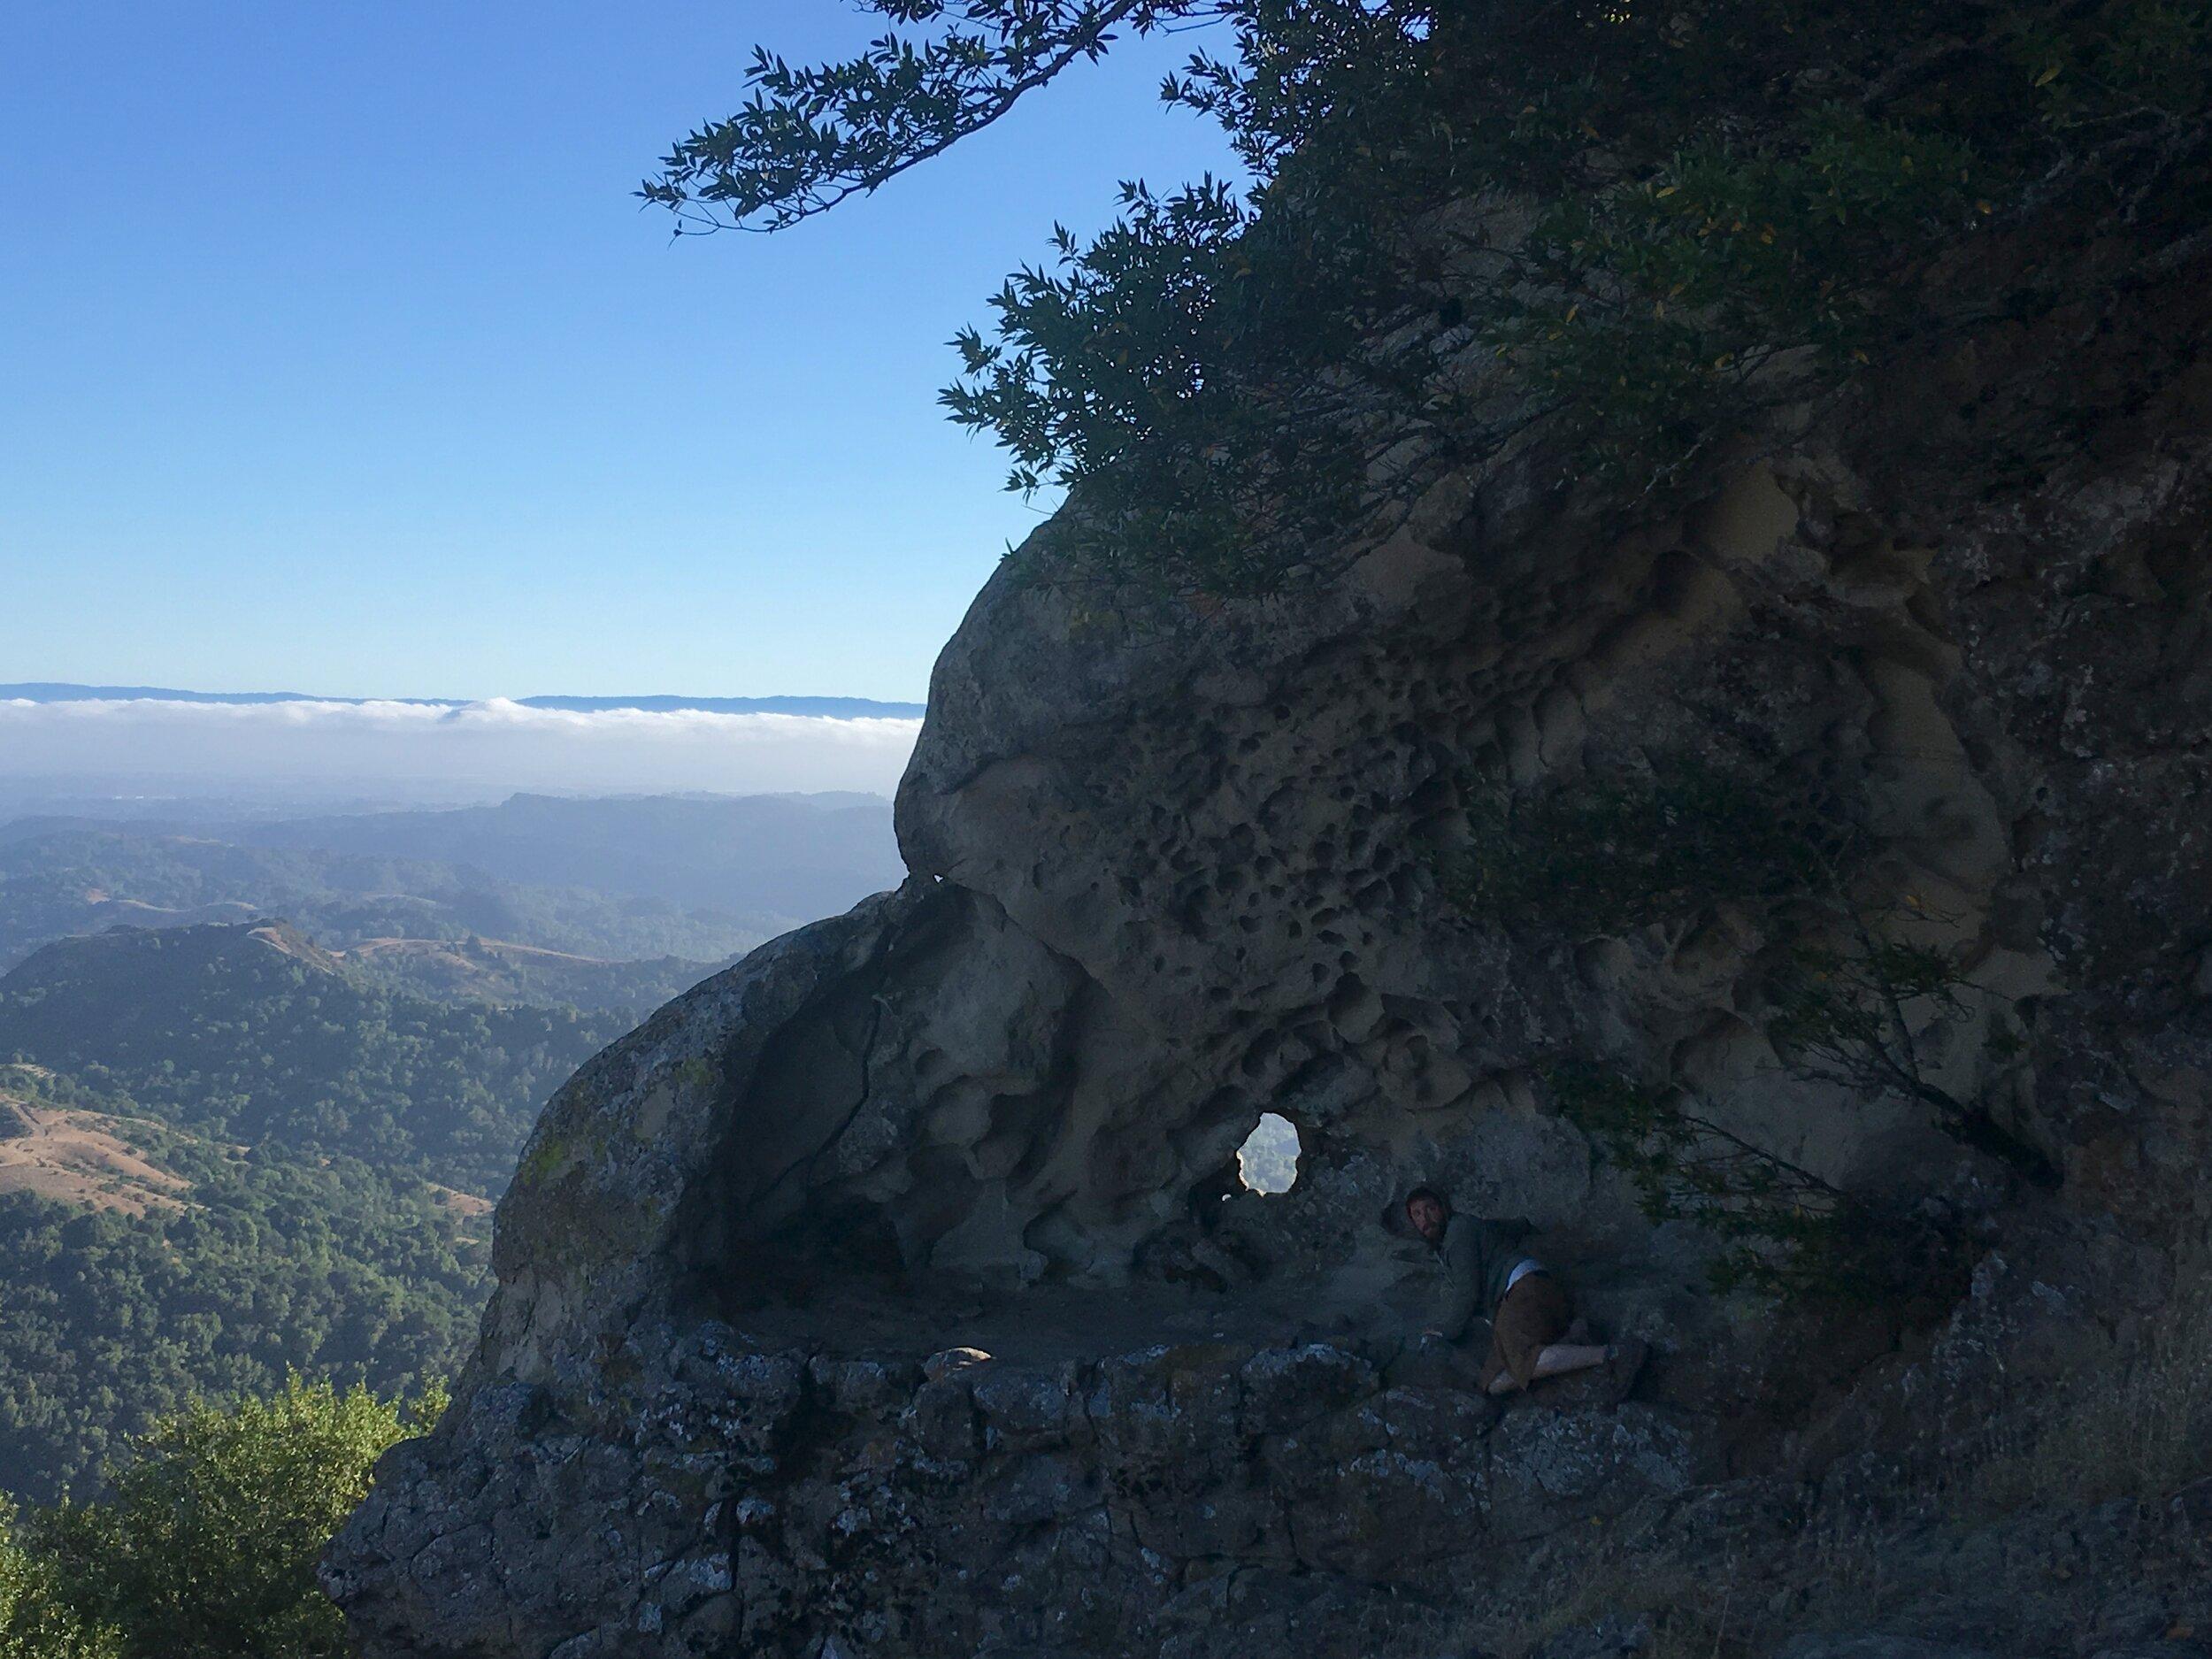 Rocky Ridge Tafoni at Los Trampas Regional Wilderness